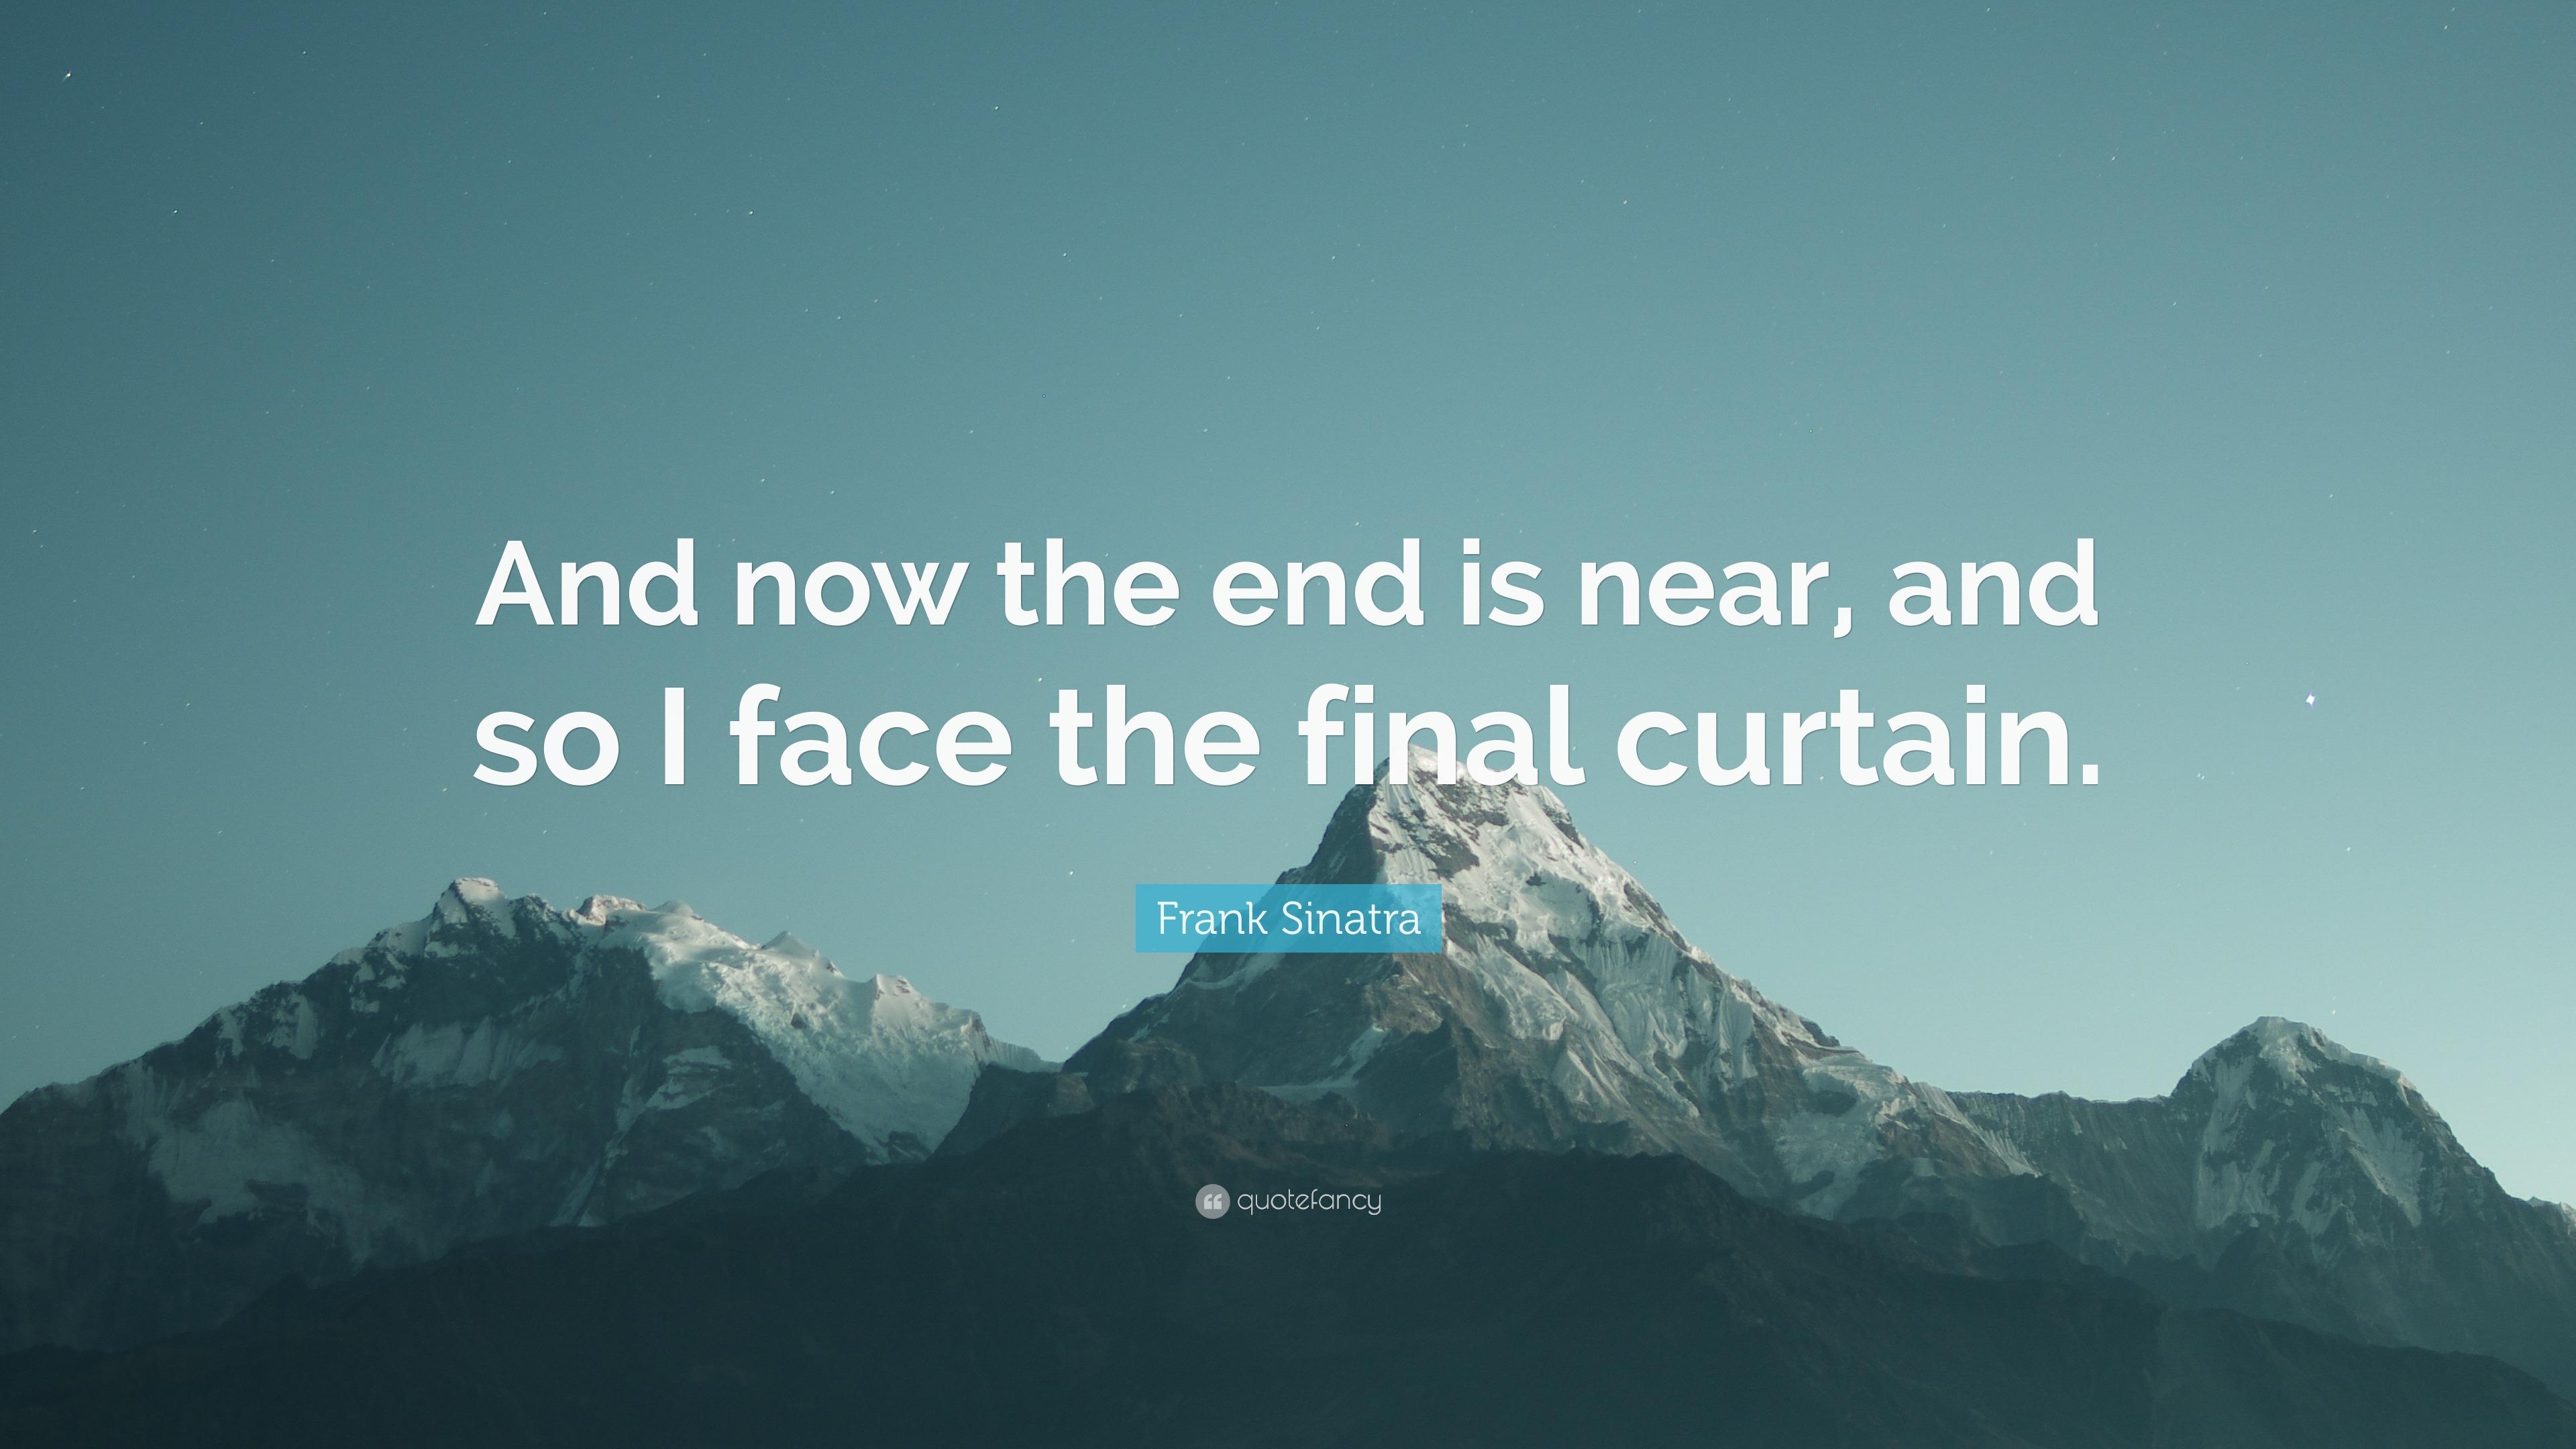 Frank Sinatra And So I Face The Final Curtain